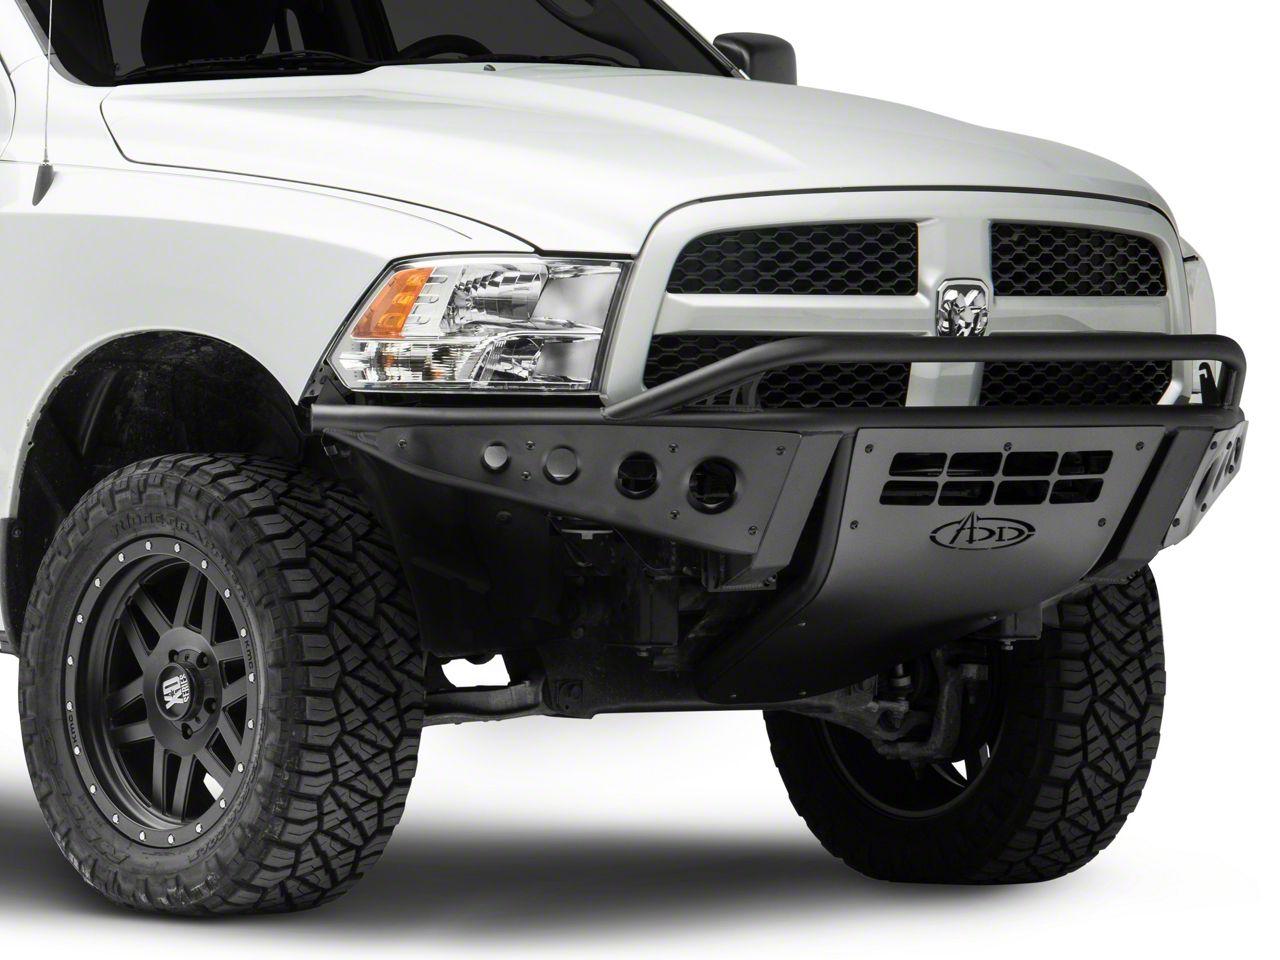 Addictive Desert Designs Stealth Front Bumper (09-18 RAM 1500, Excluding EcoDiesel & Rebel)